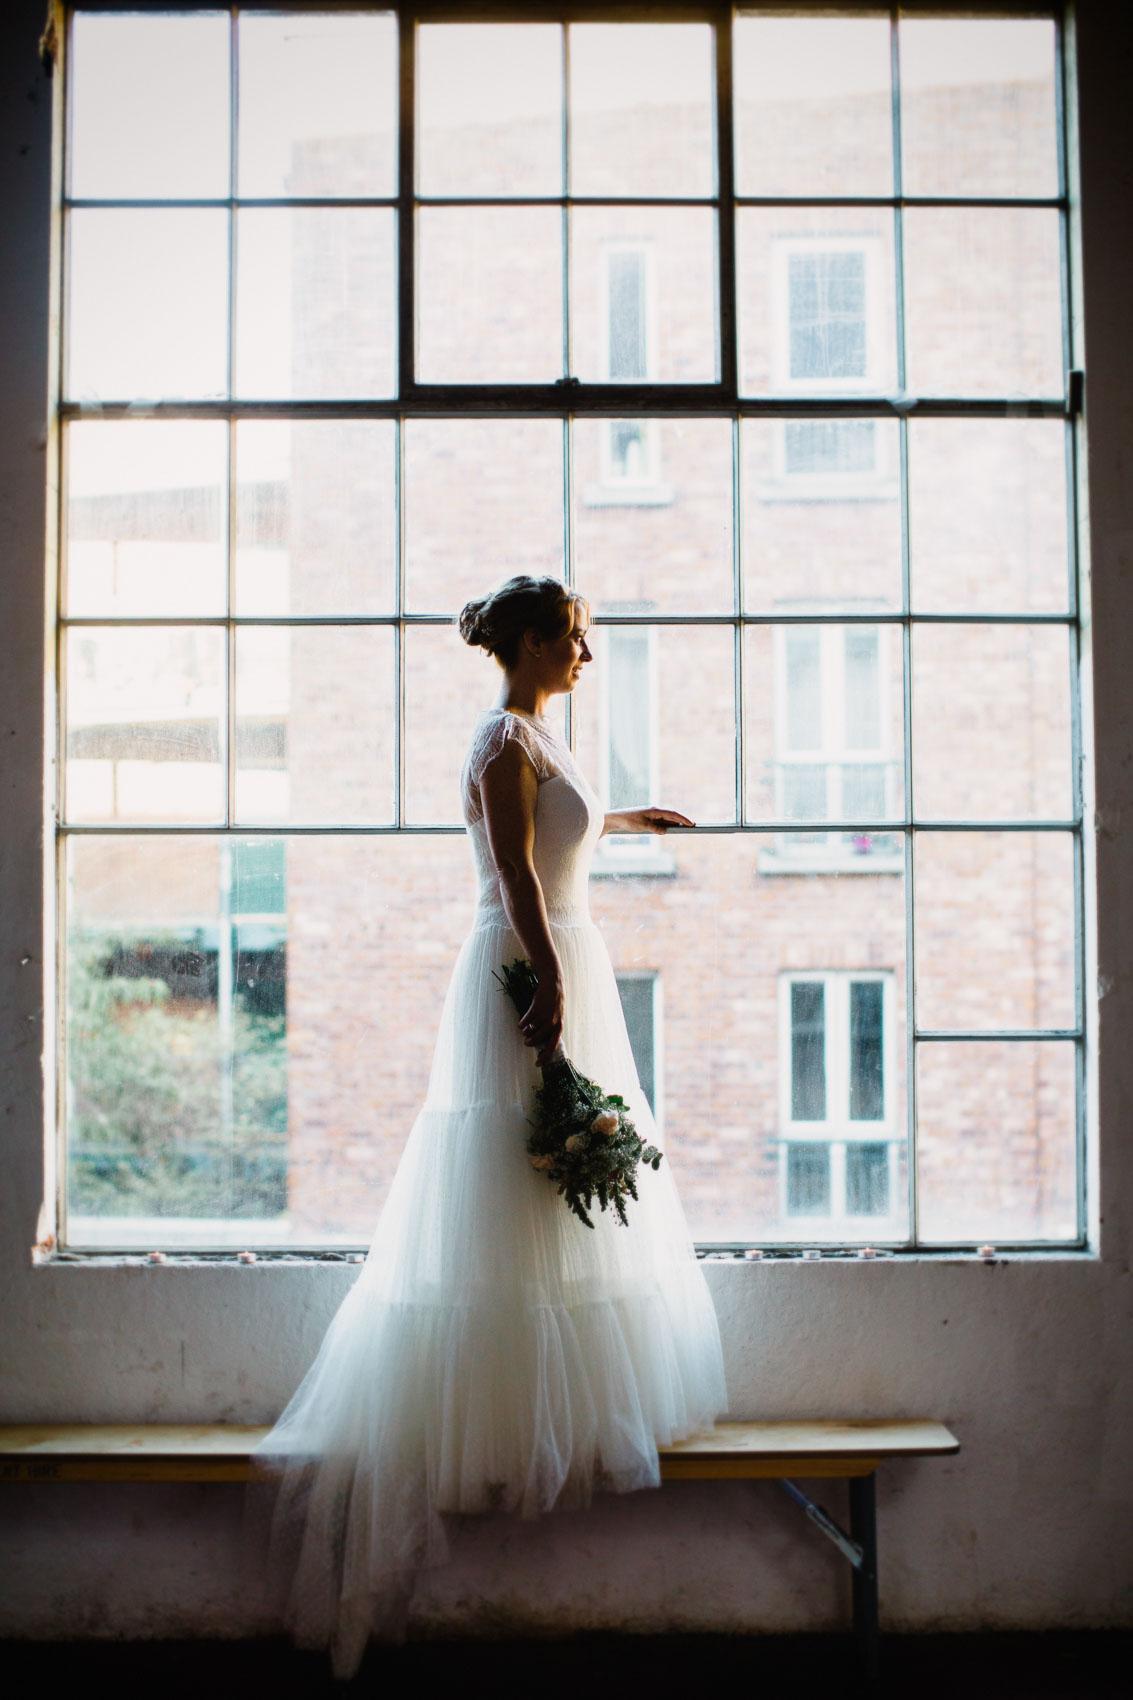 Documentary-wedding-alternative-photographer-ireland-katie-farrell0120